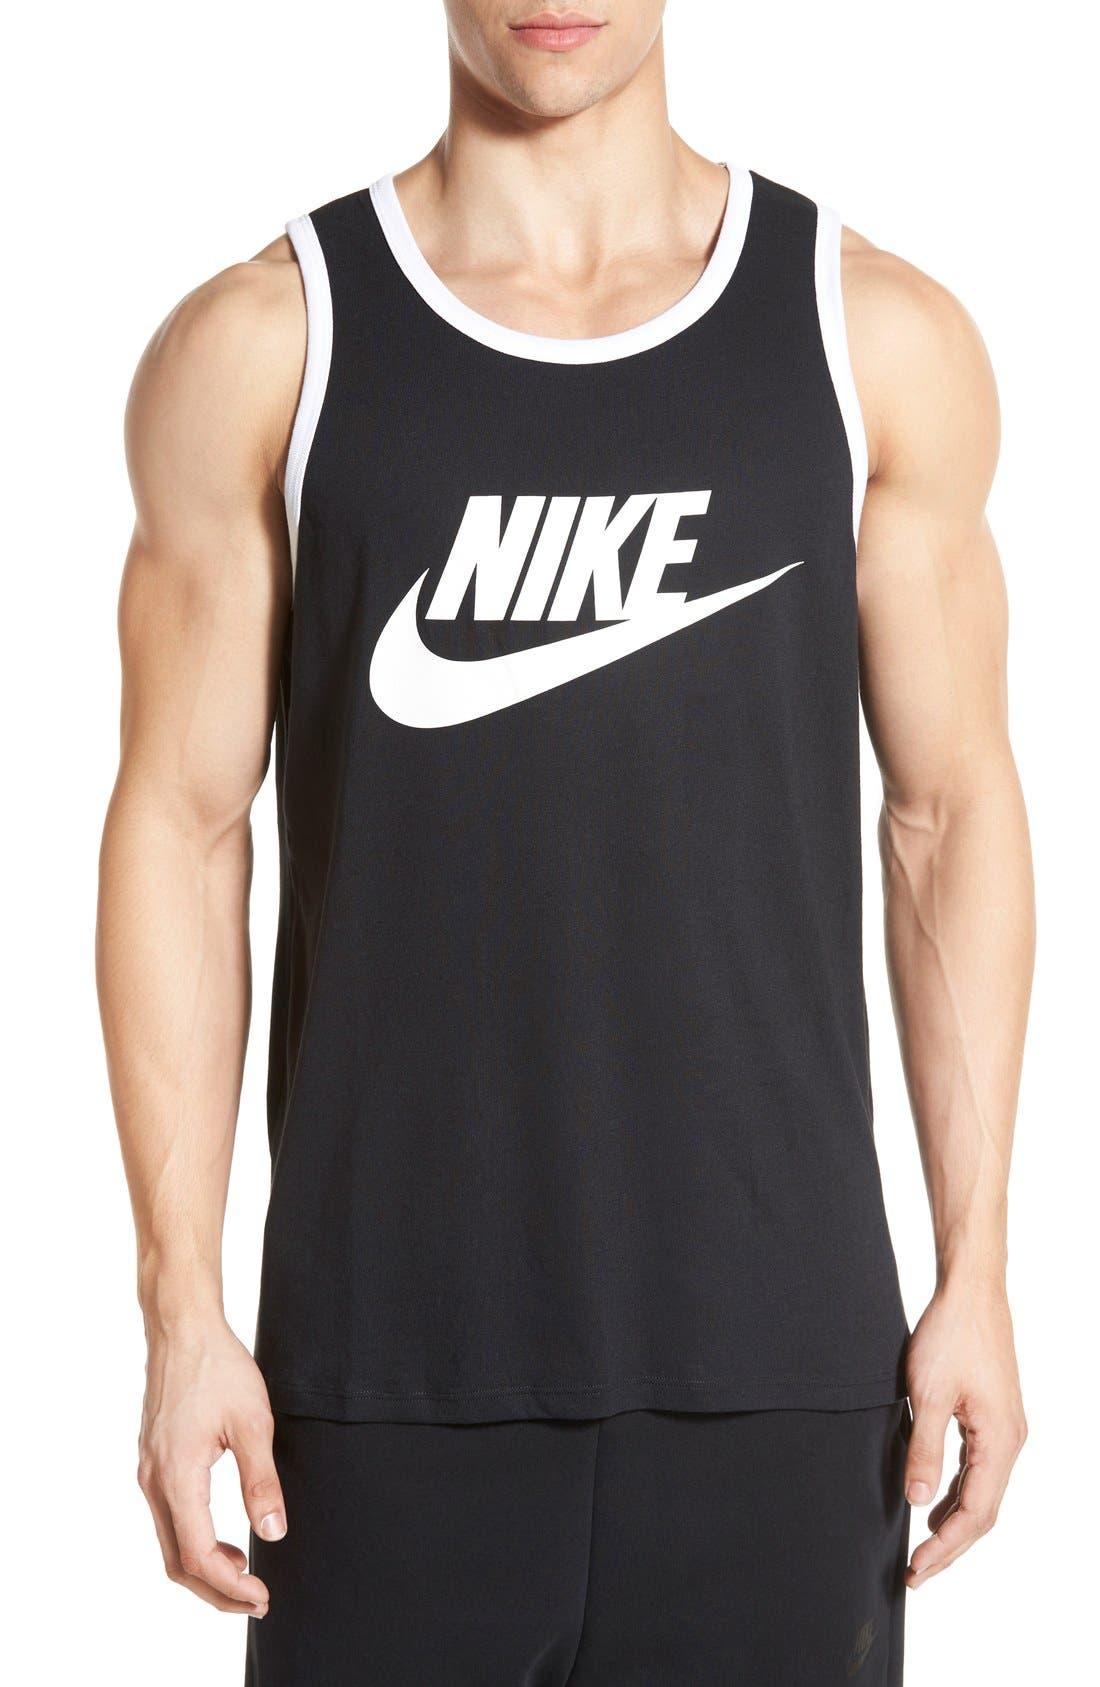 'Ace Sportswear Logo' Graphic Tank,                             Main thumbnail 1, color,                             Black/ White/ White